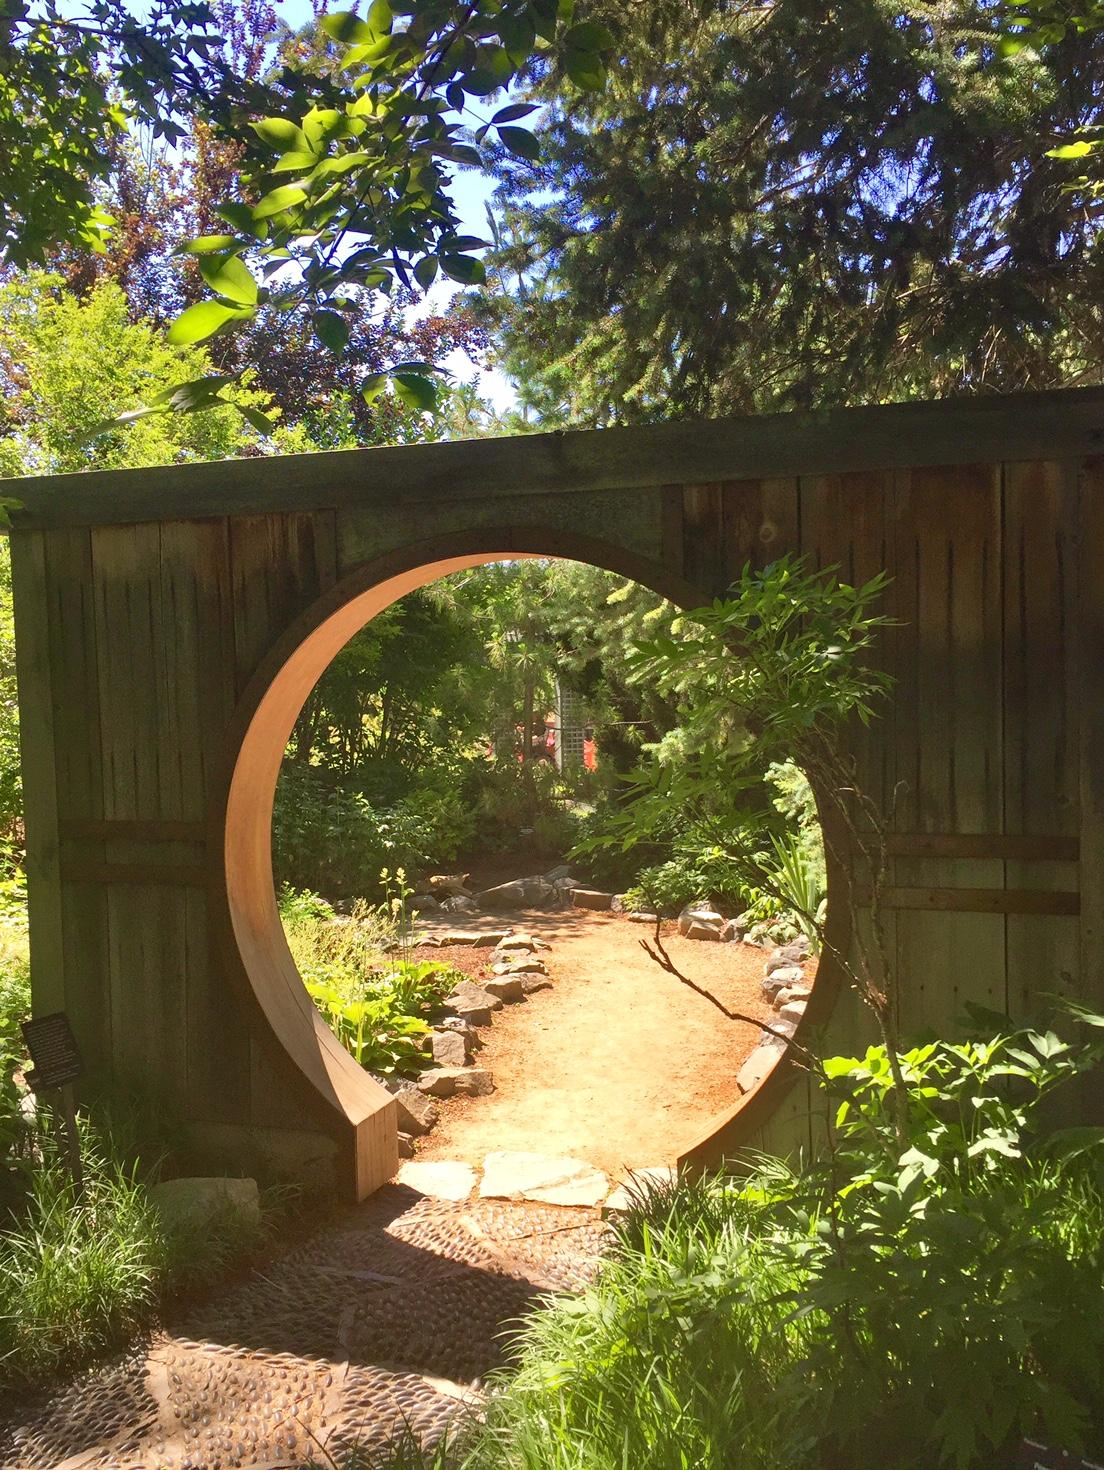 The Inspiration of a Beautiful Garden – AlvaradoFrazier